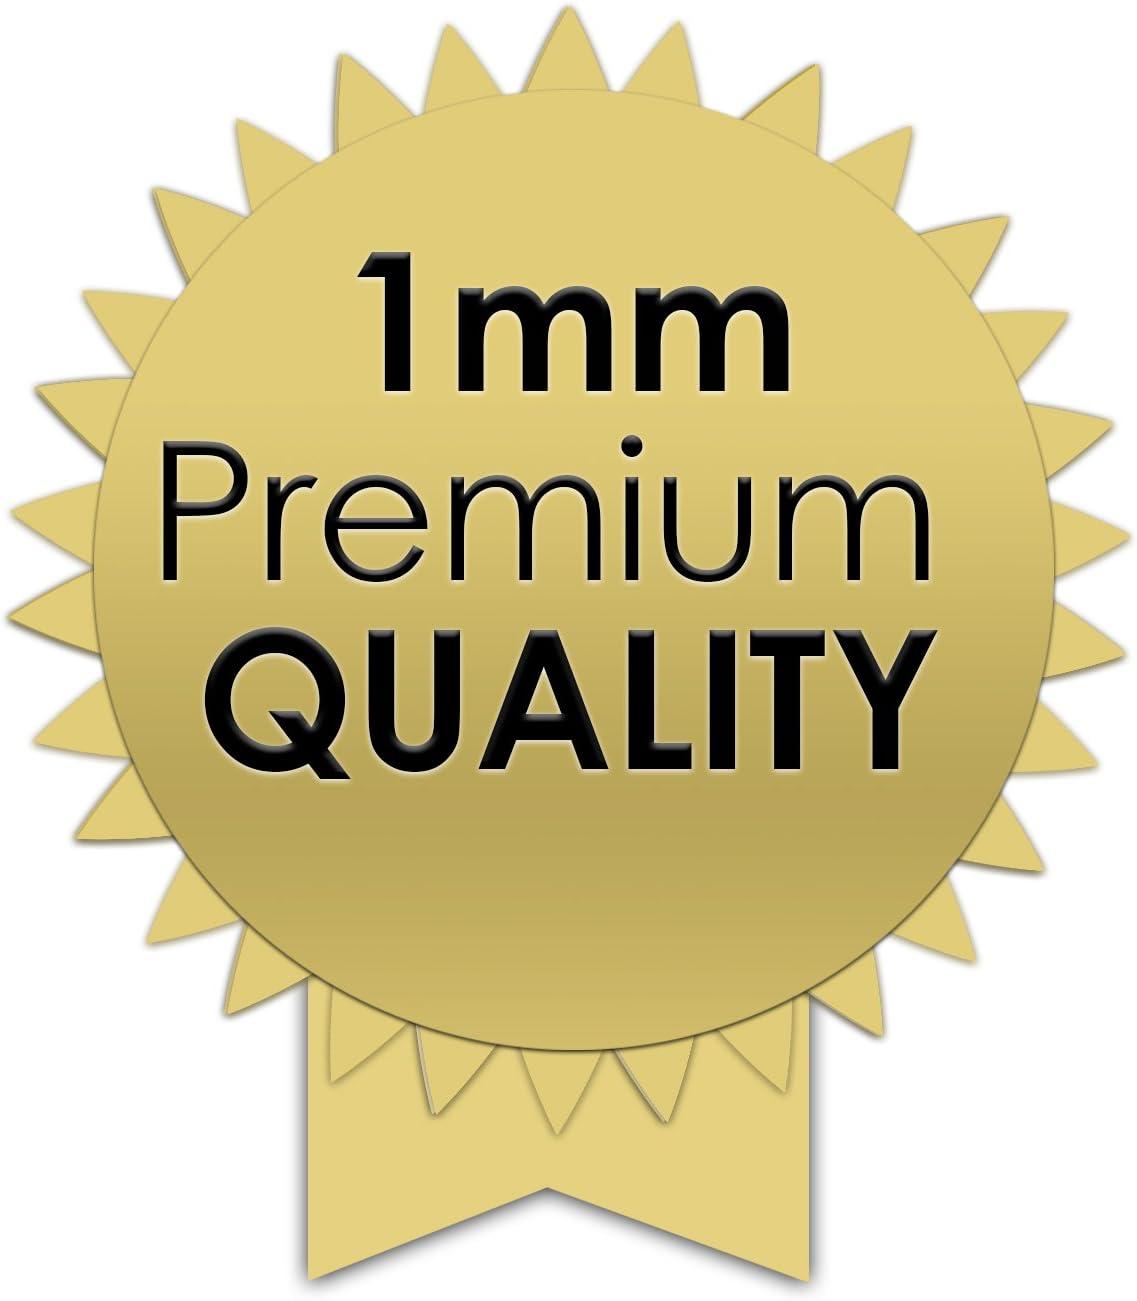 1mm st/ärke 10 cm MUSTER 10mm PREMIUM FUCHS Fliesenschiene Viertelkreisprofil Aluminium Eloxiert silber matt H/öhe